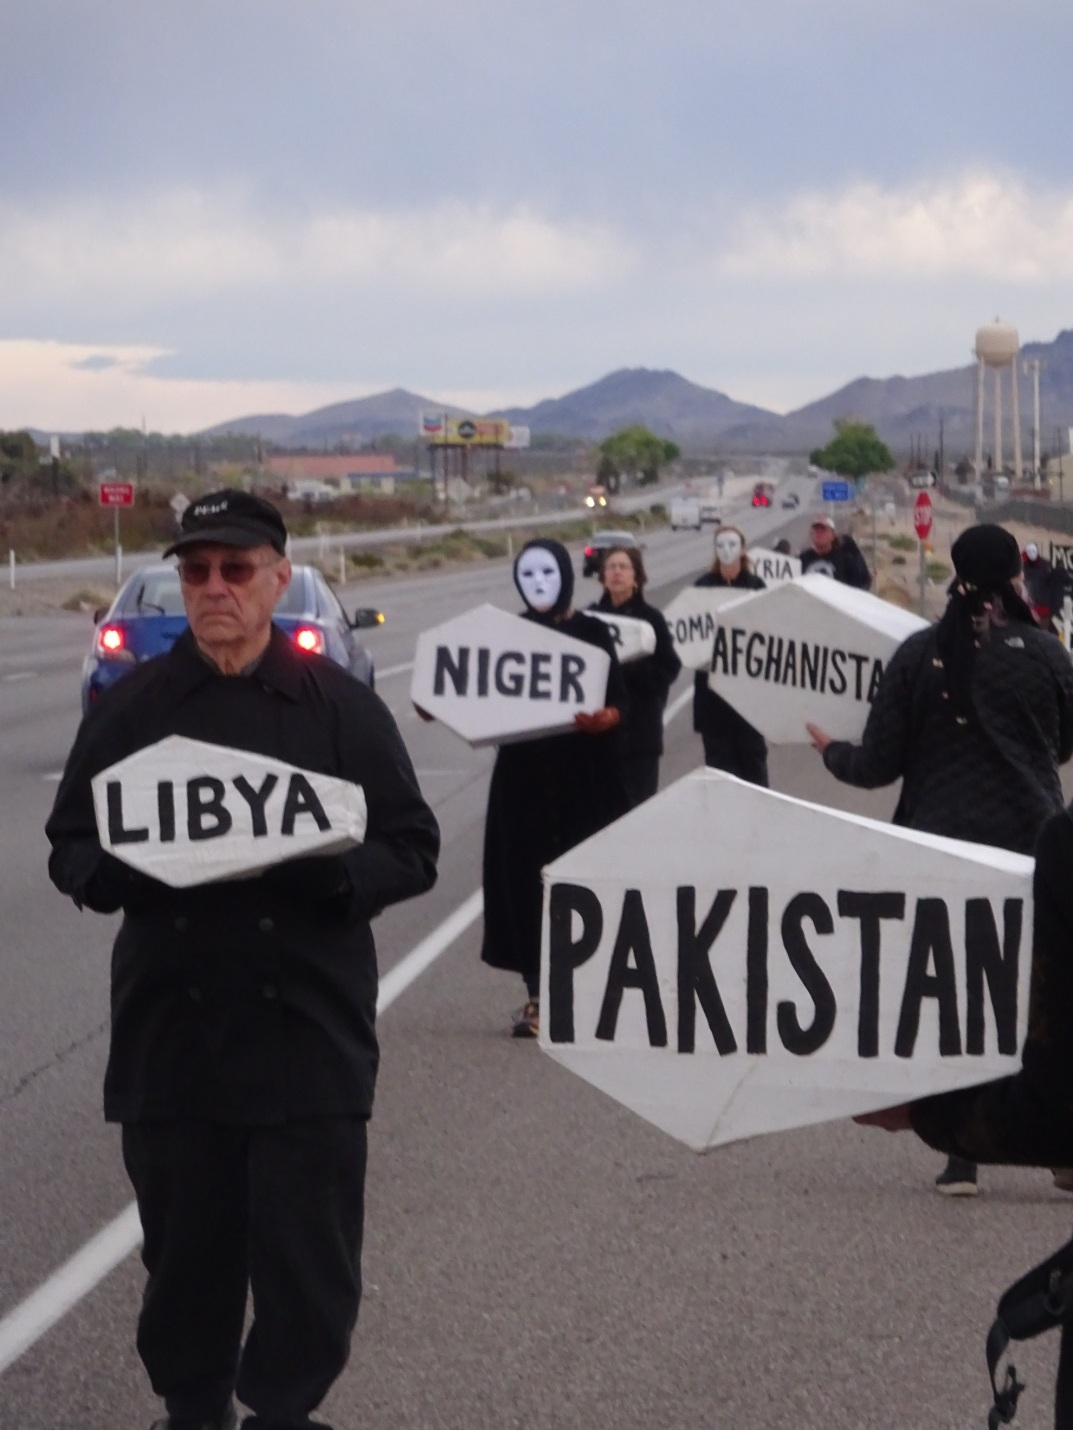 pakistan+libya+niger.jpg